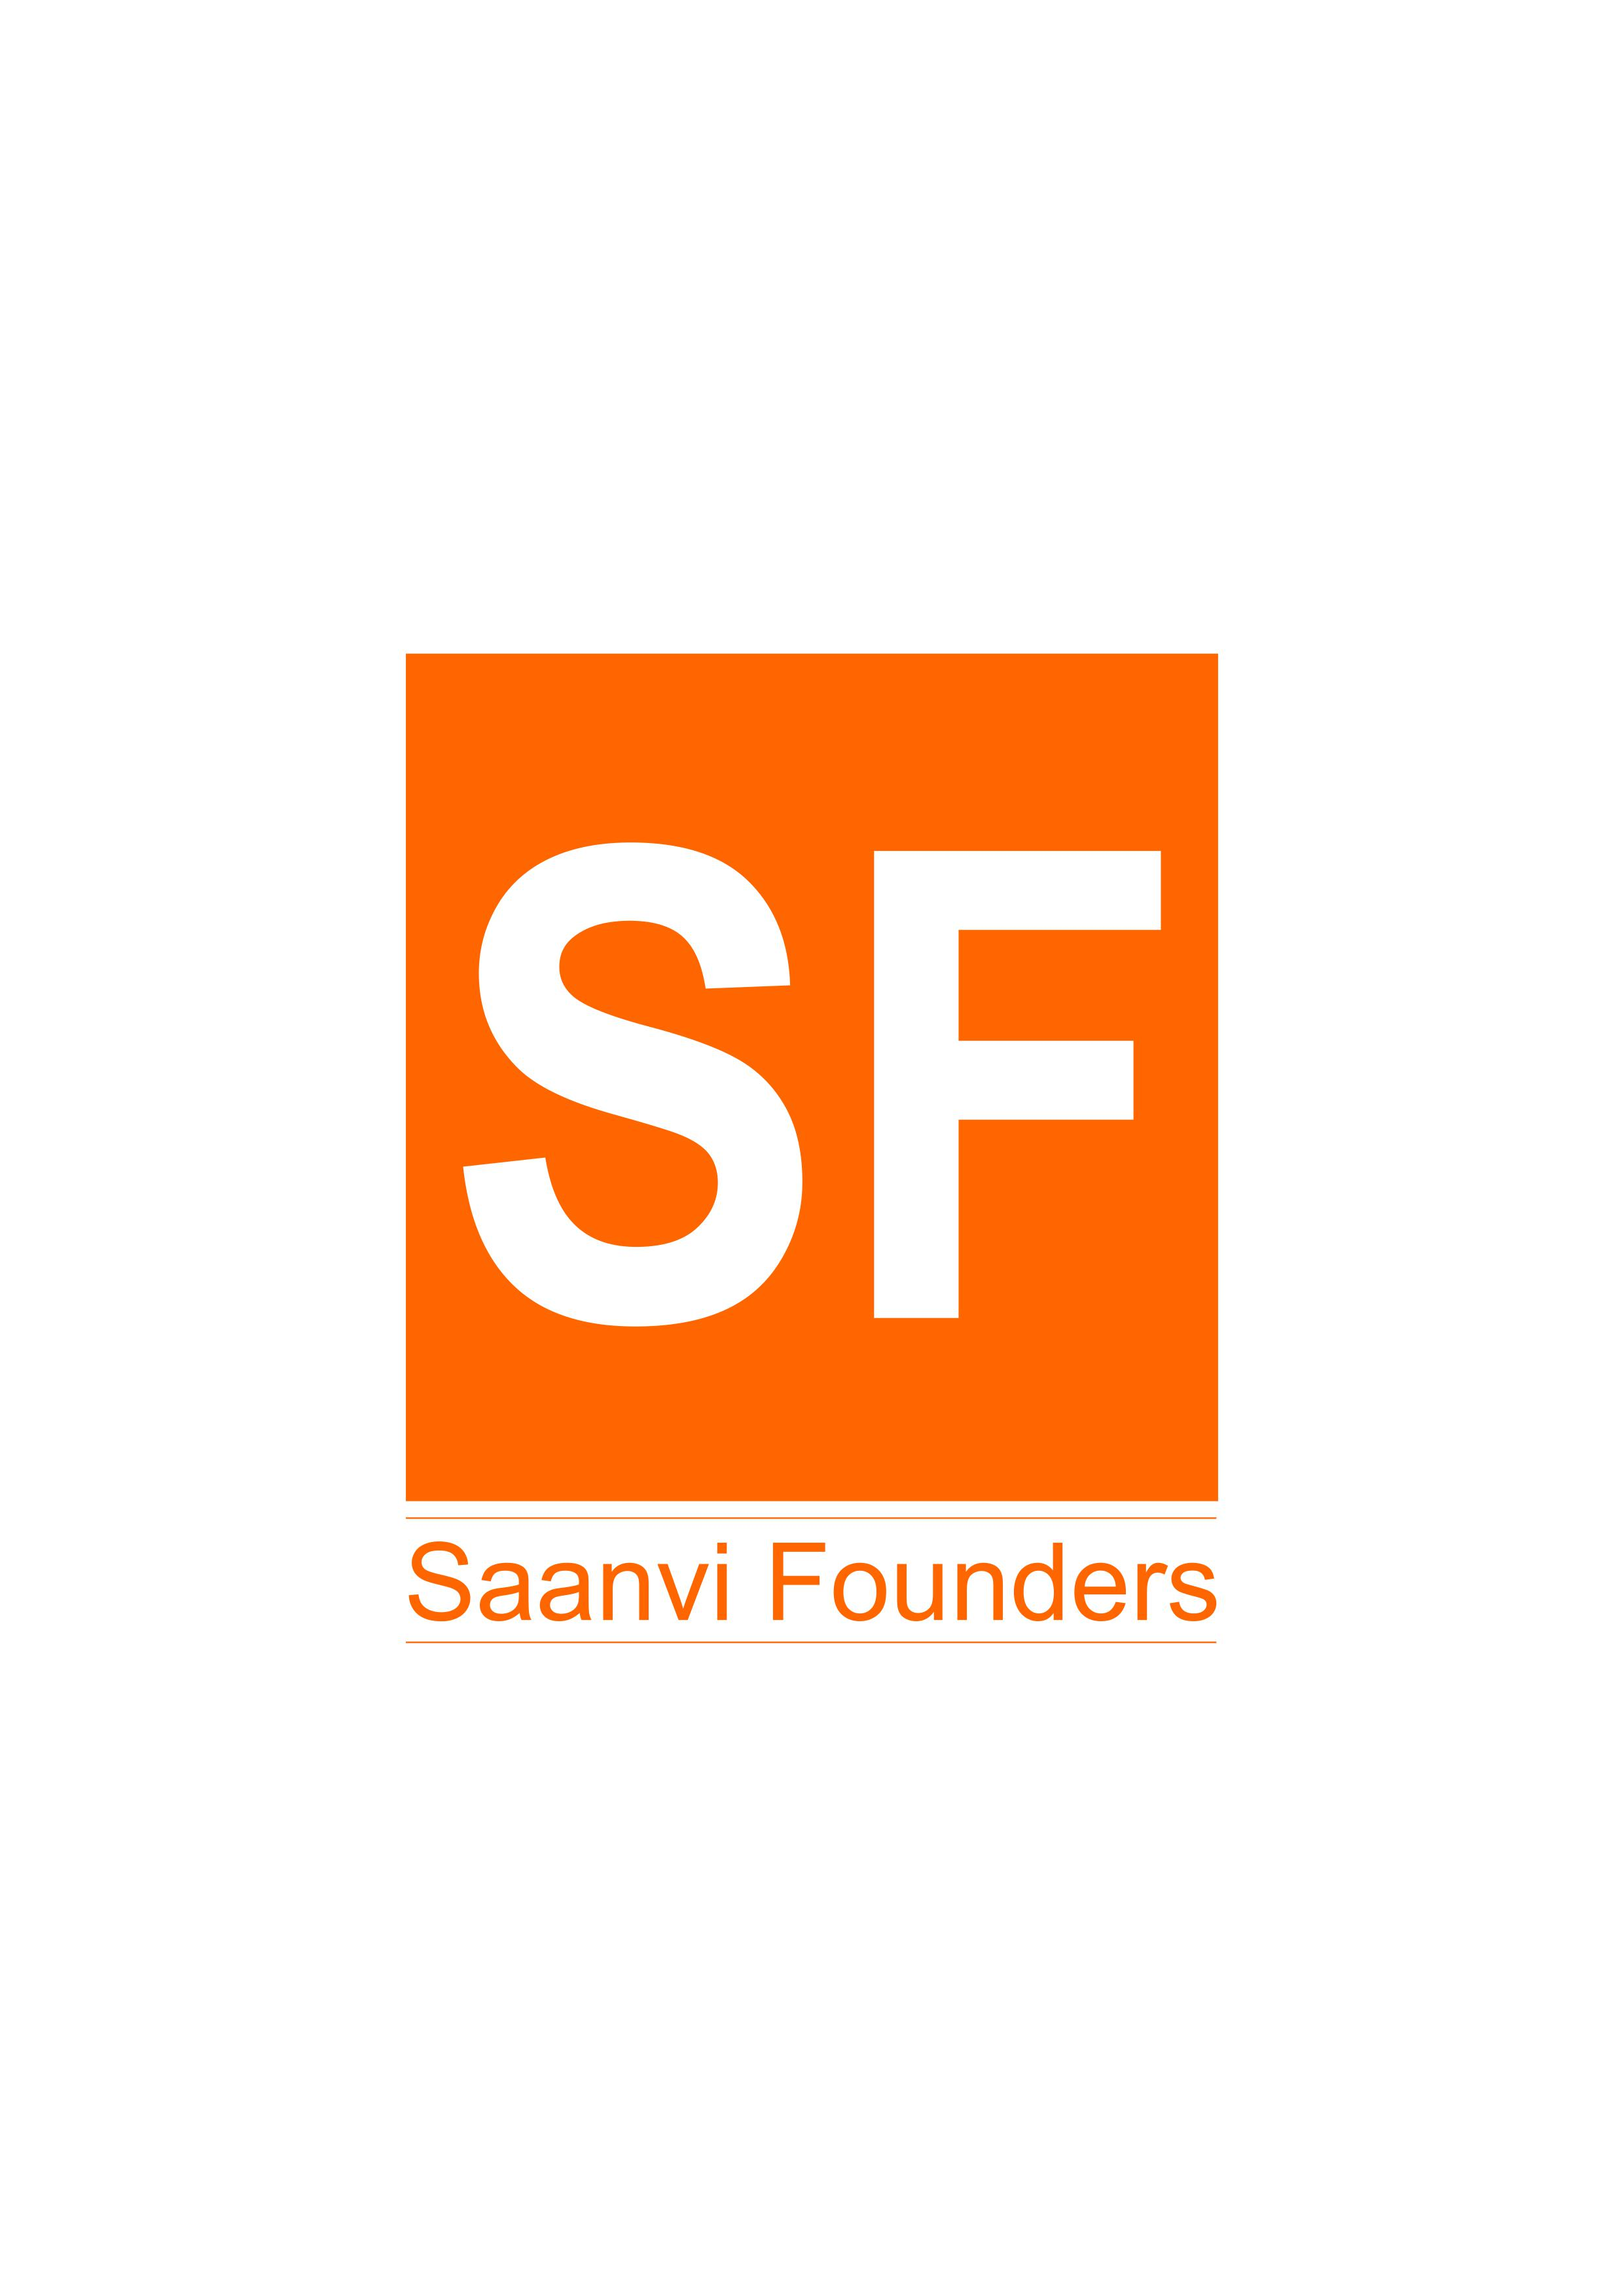 Saanvi Founders